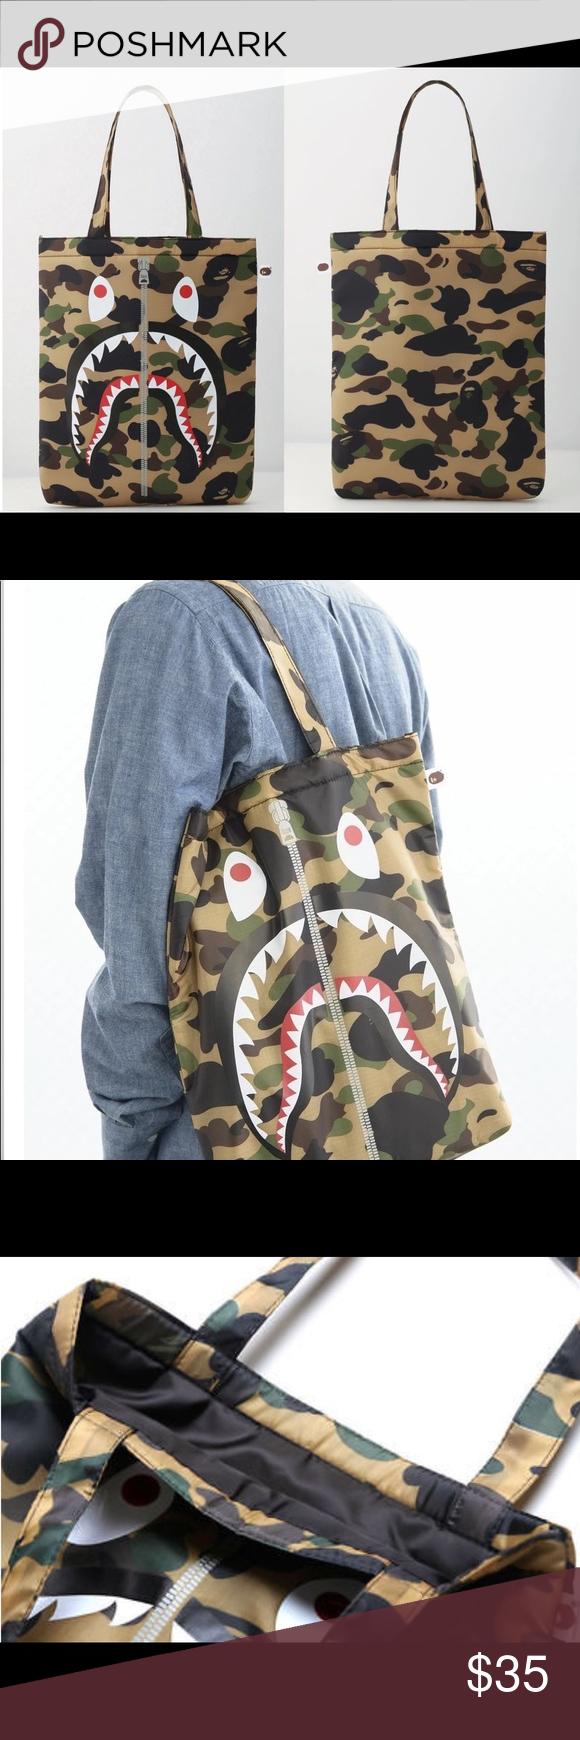 "37206f8002b A Bathing Ape Bape Shark Camo tote shoulder bag Quantity  1 unit. Size   12.2"" (W) x 14.5"